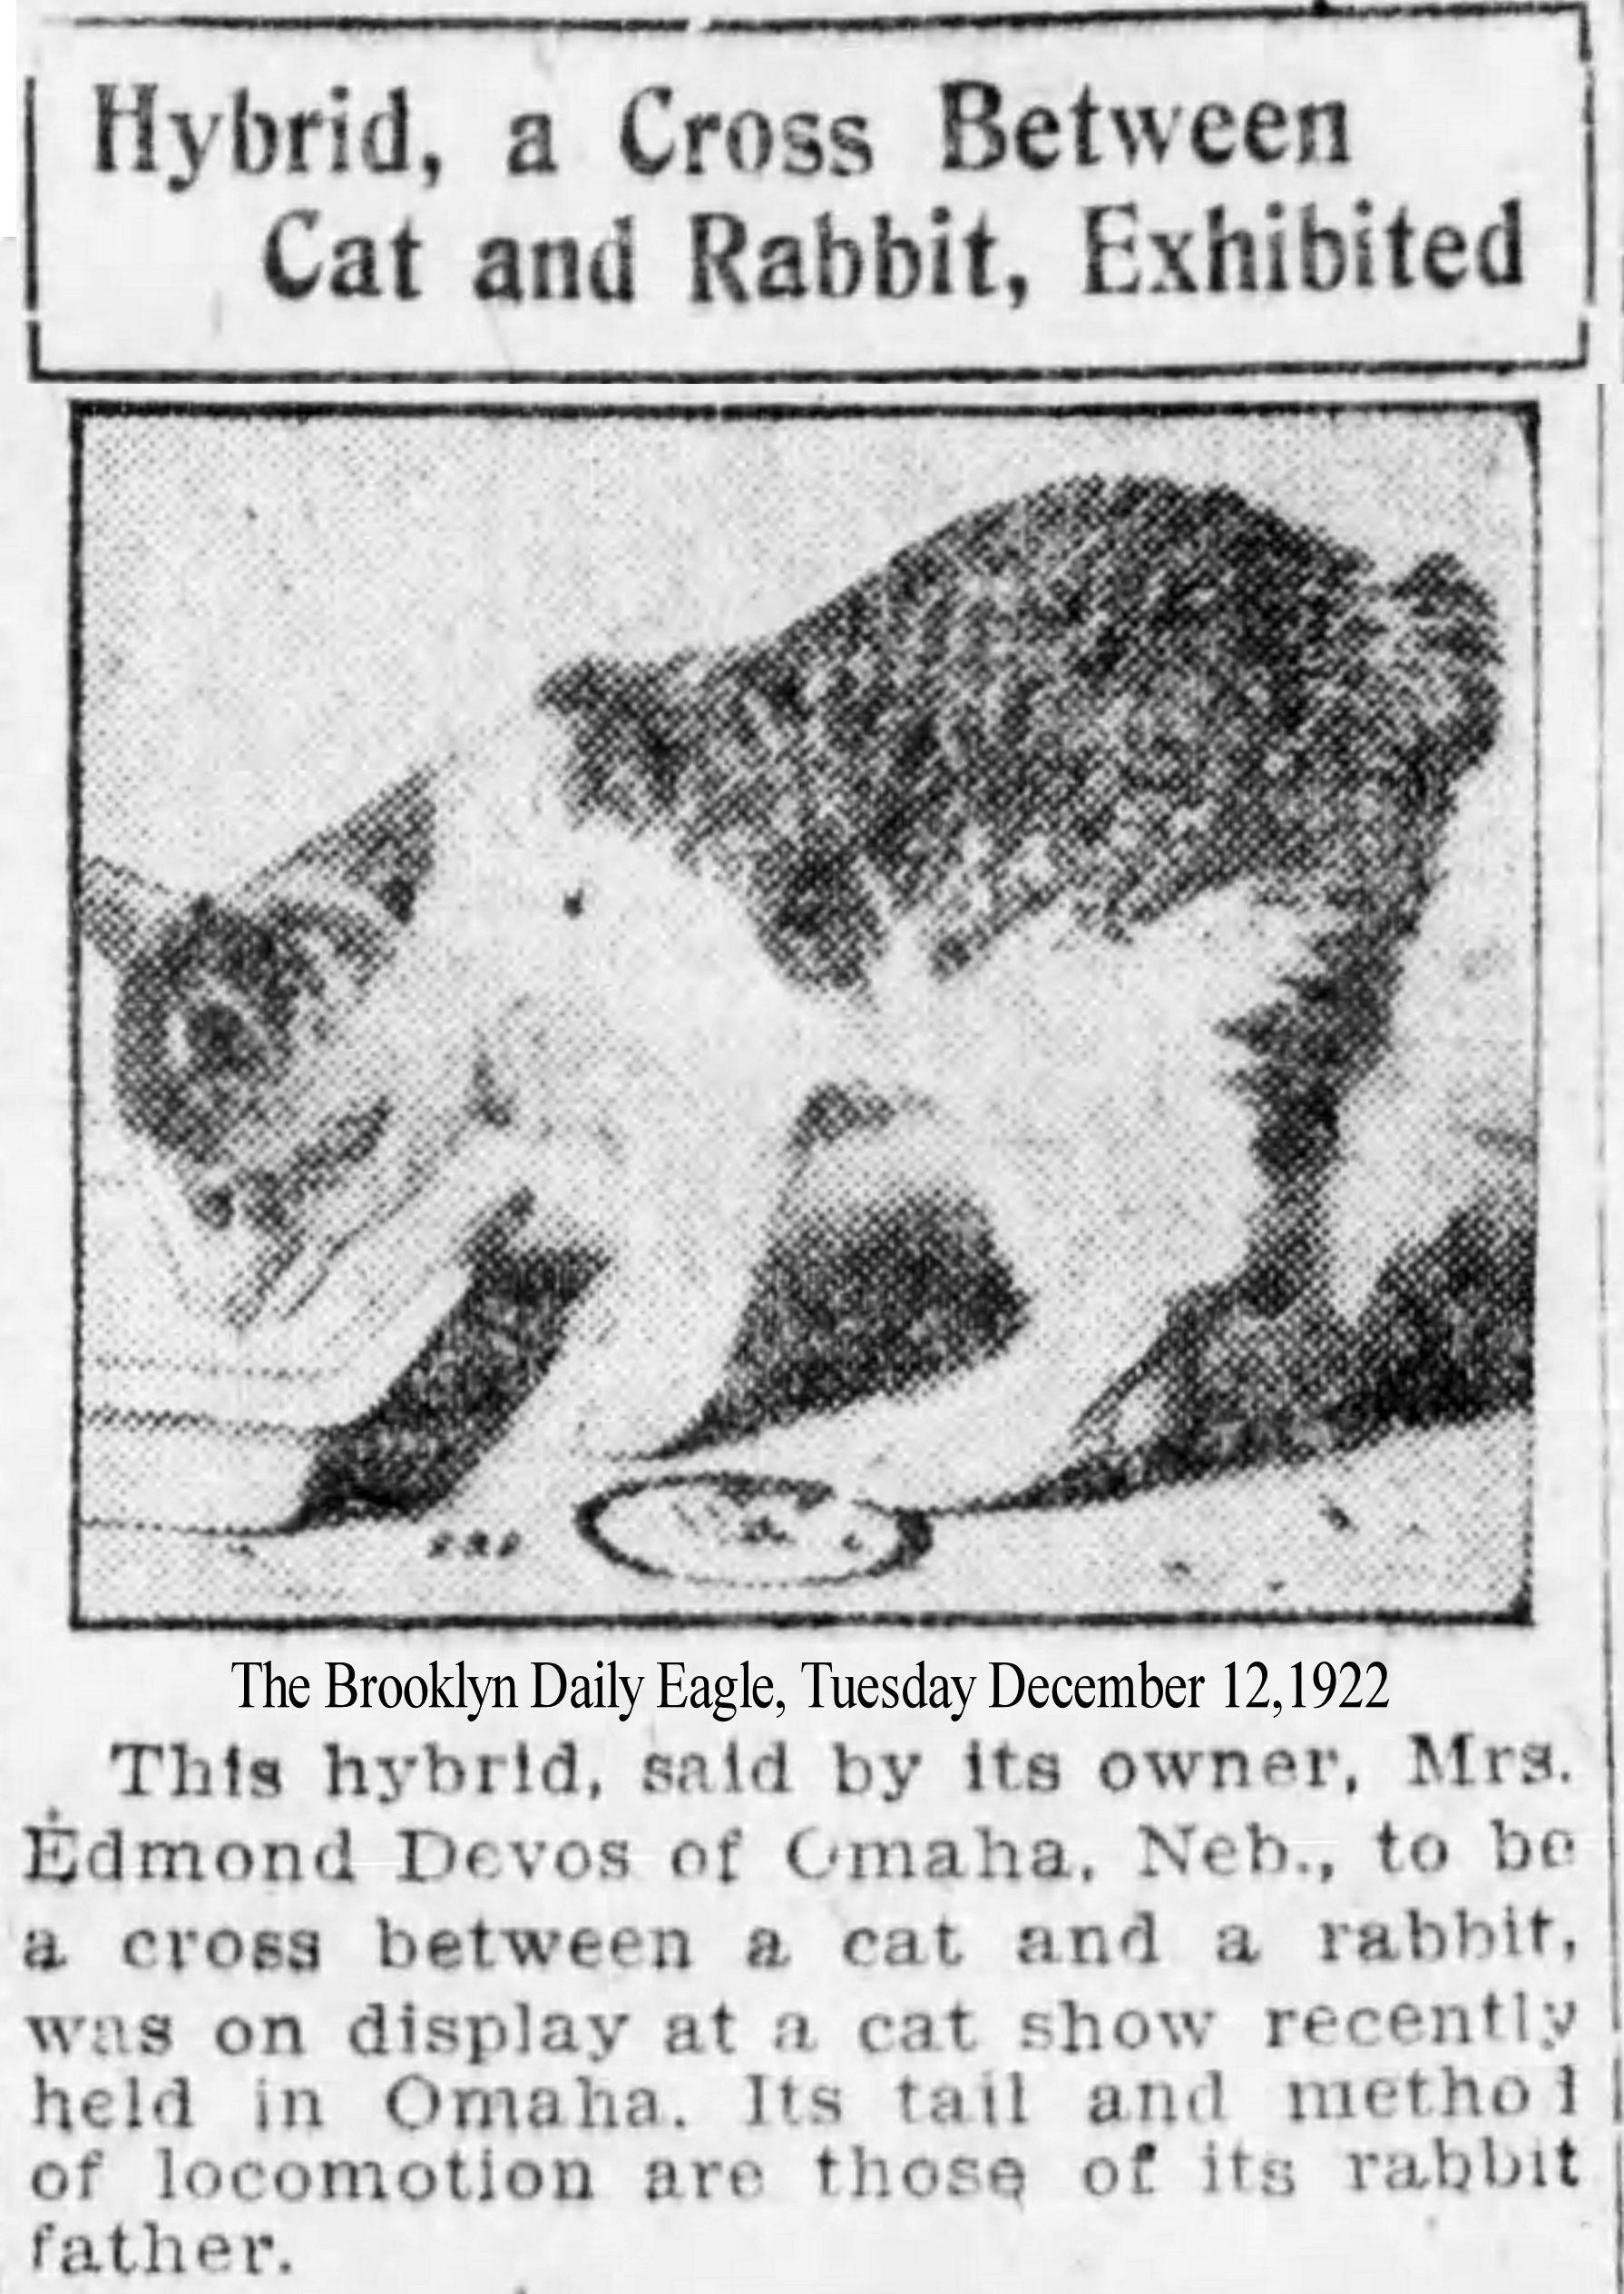 1934 Culver Citizen Runs Article By Samuel E Perkins Iii Formerly President Of Indiana Audubon Society Describing 3 Strange Kittens At Morgan County